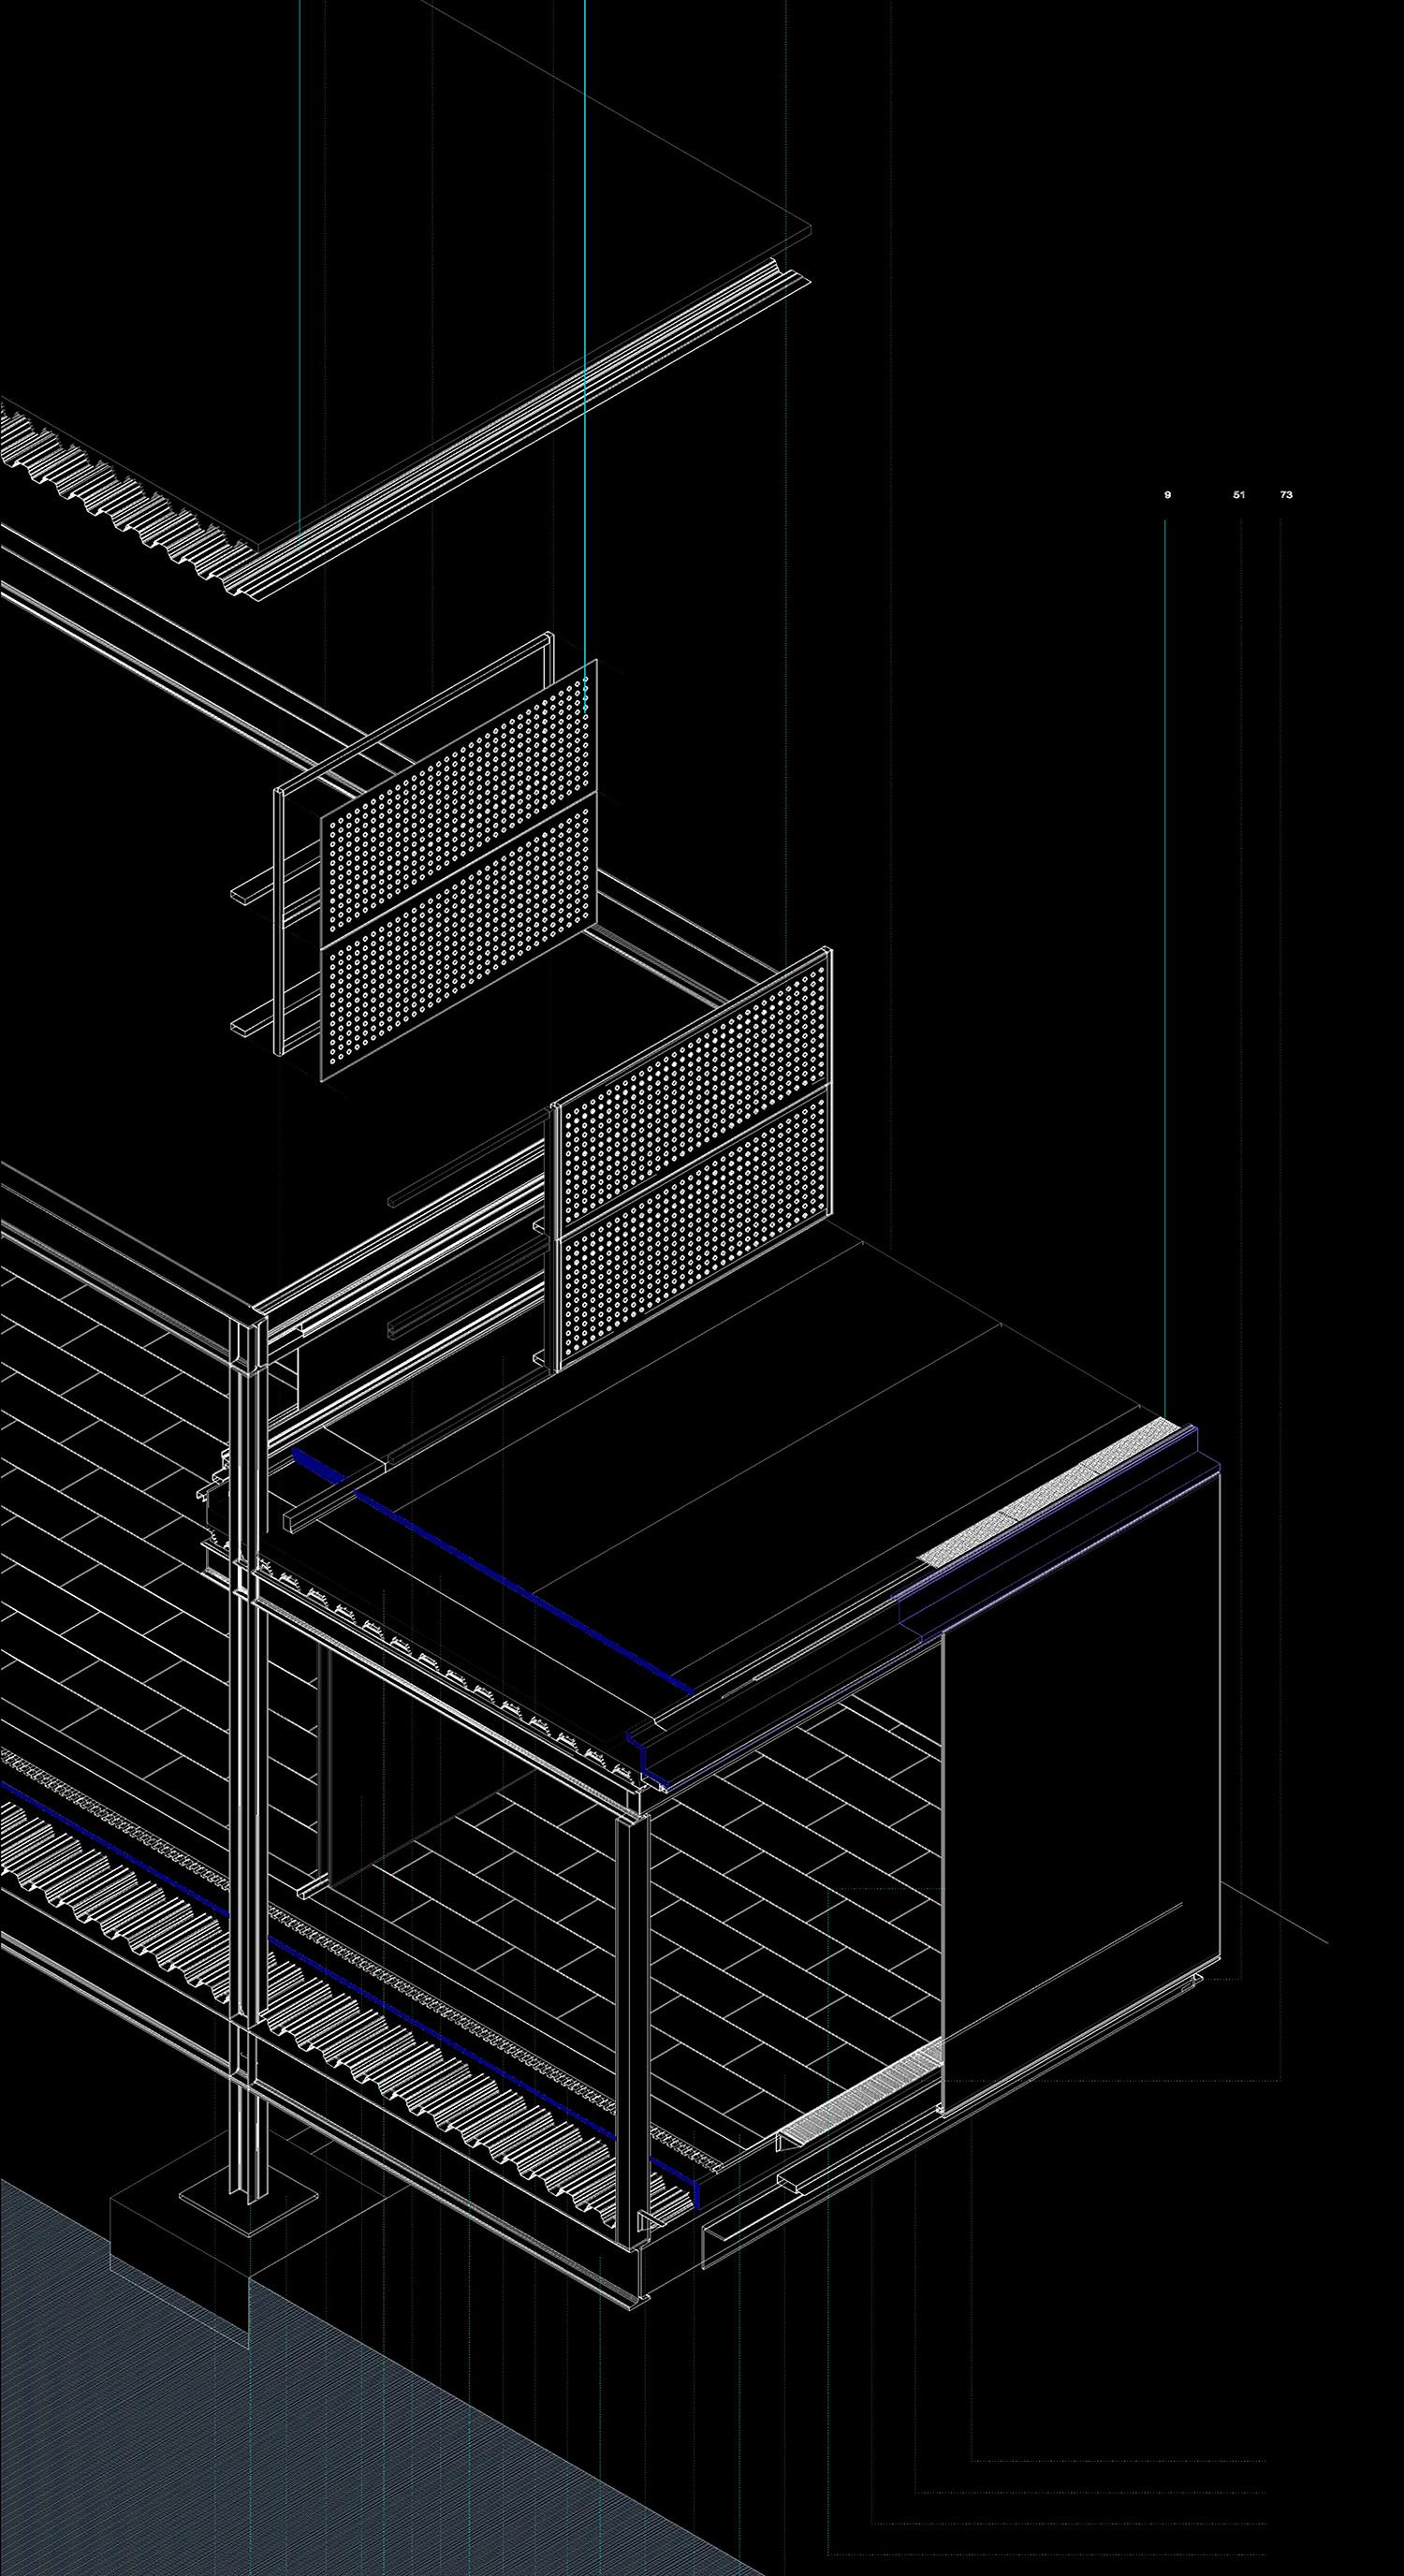 http://www.oa-arquitectes.com/wp-content/uploads/2018/05/05-2.jpg